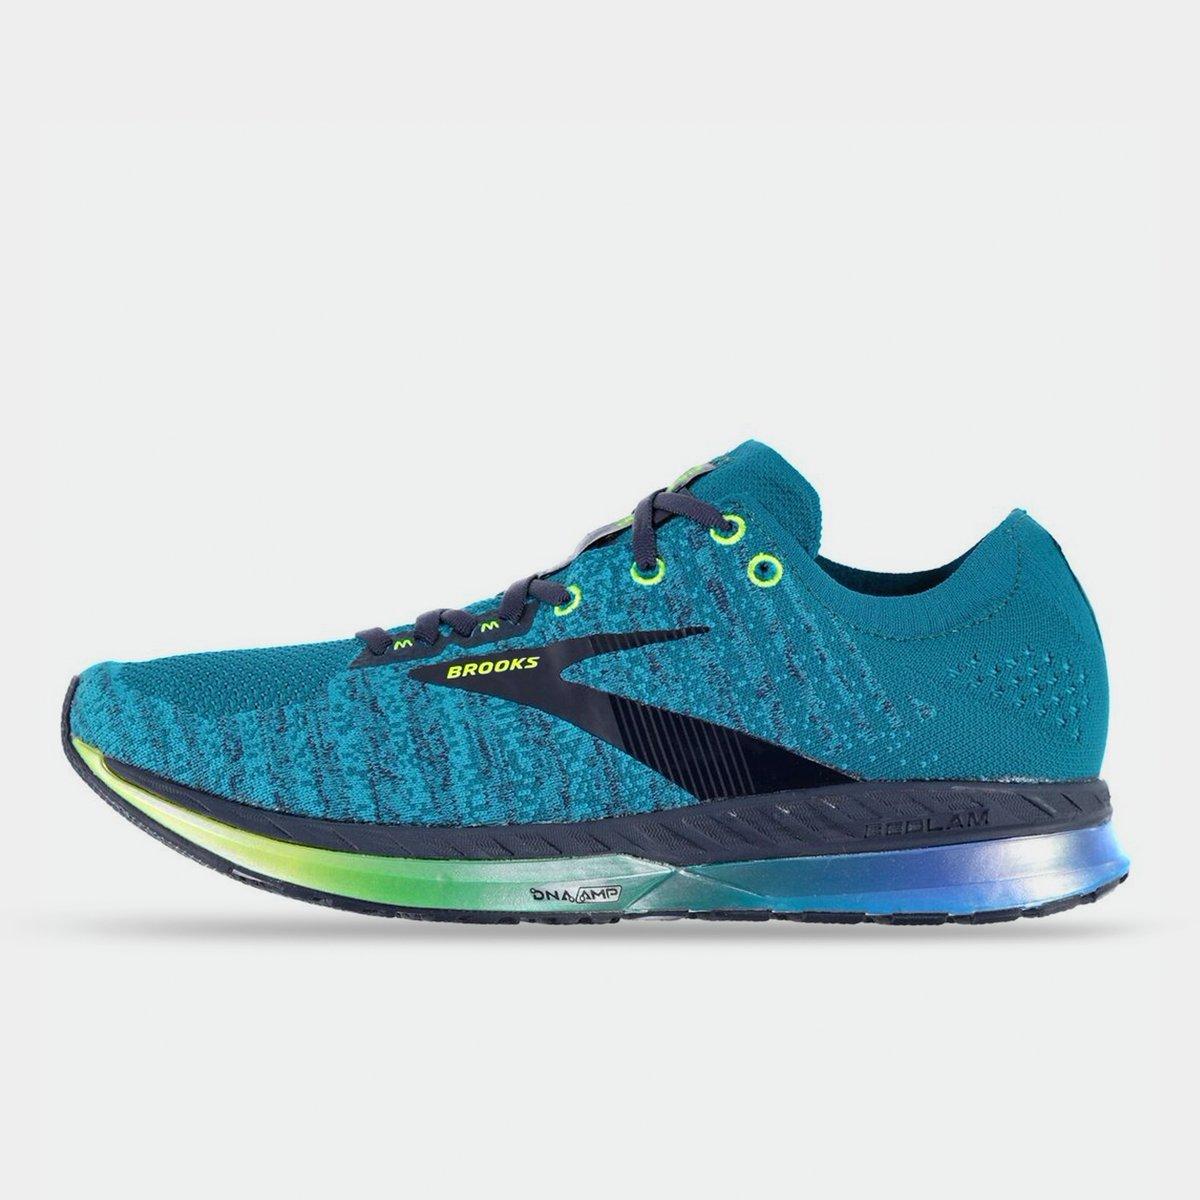 Bedlam 2 Mens Running Shoes